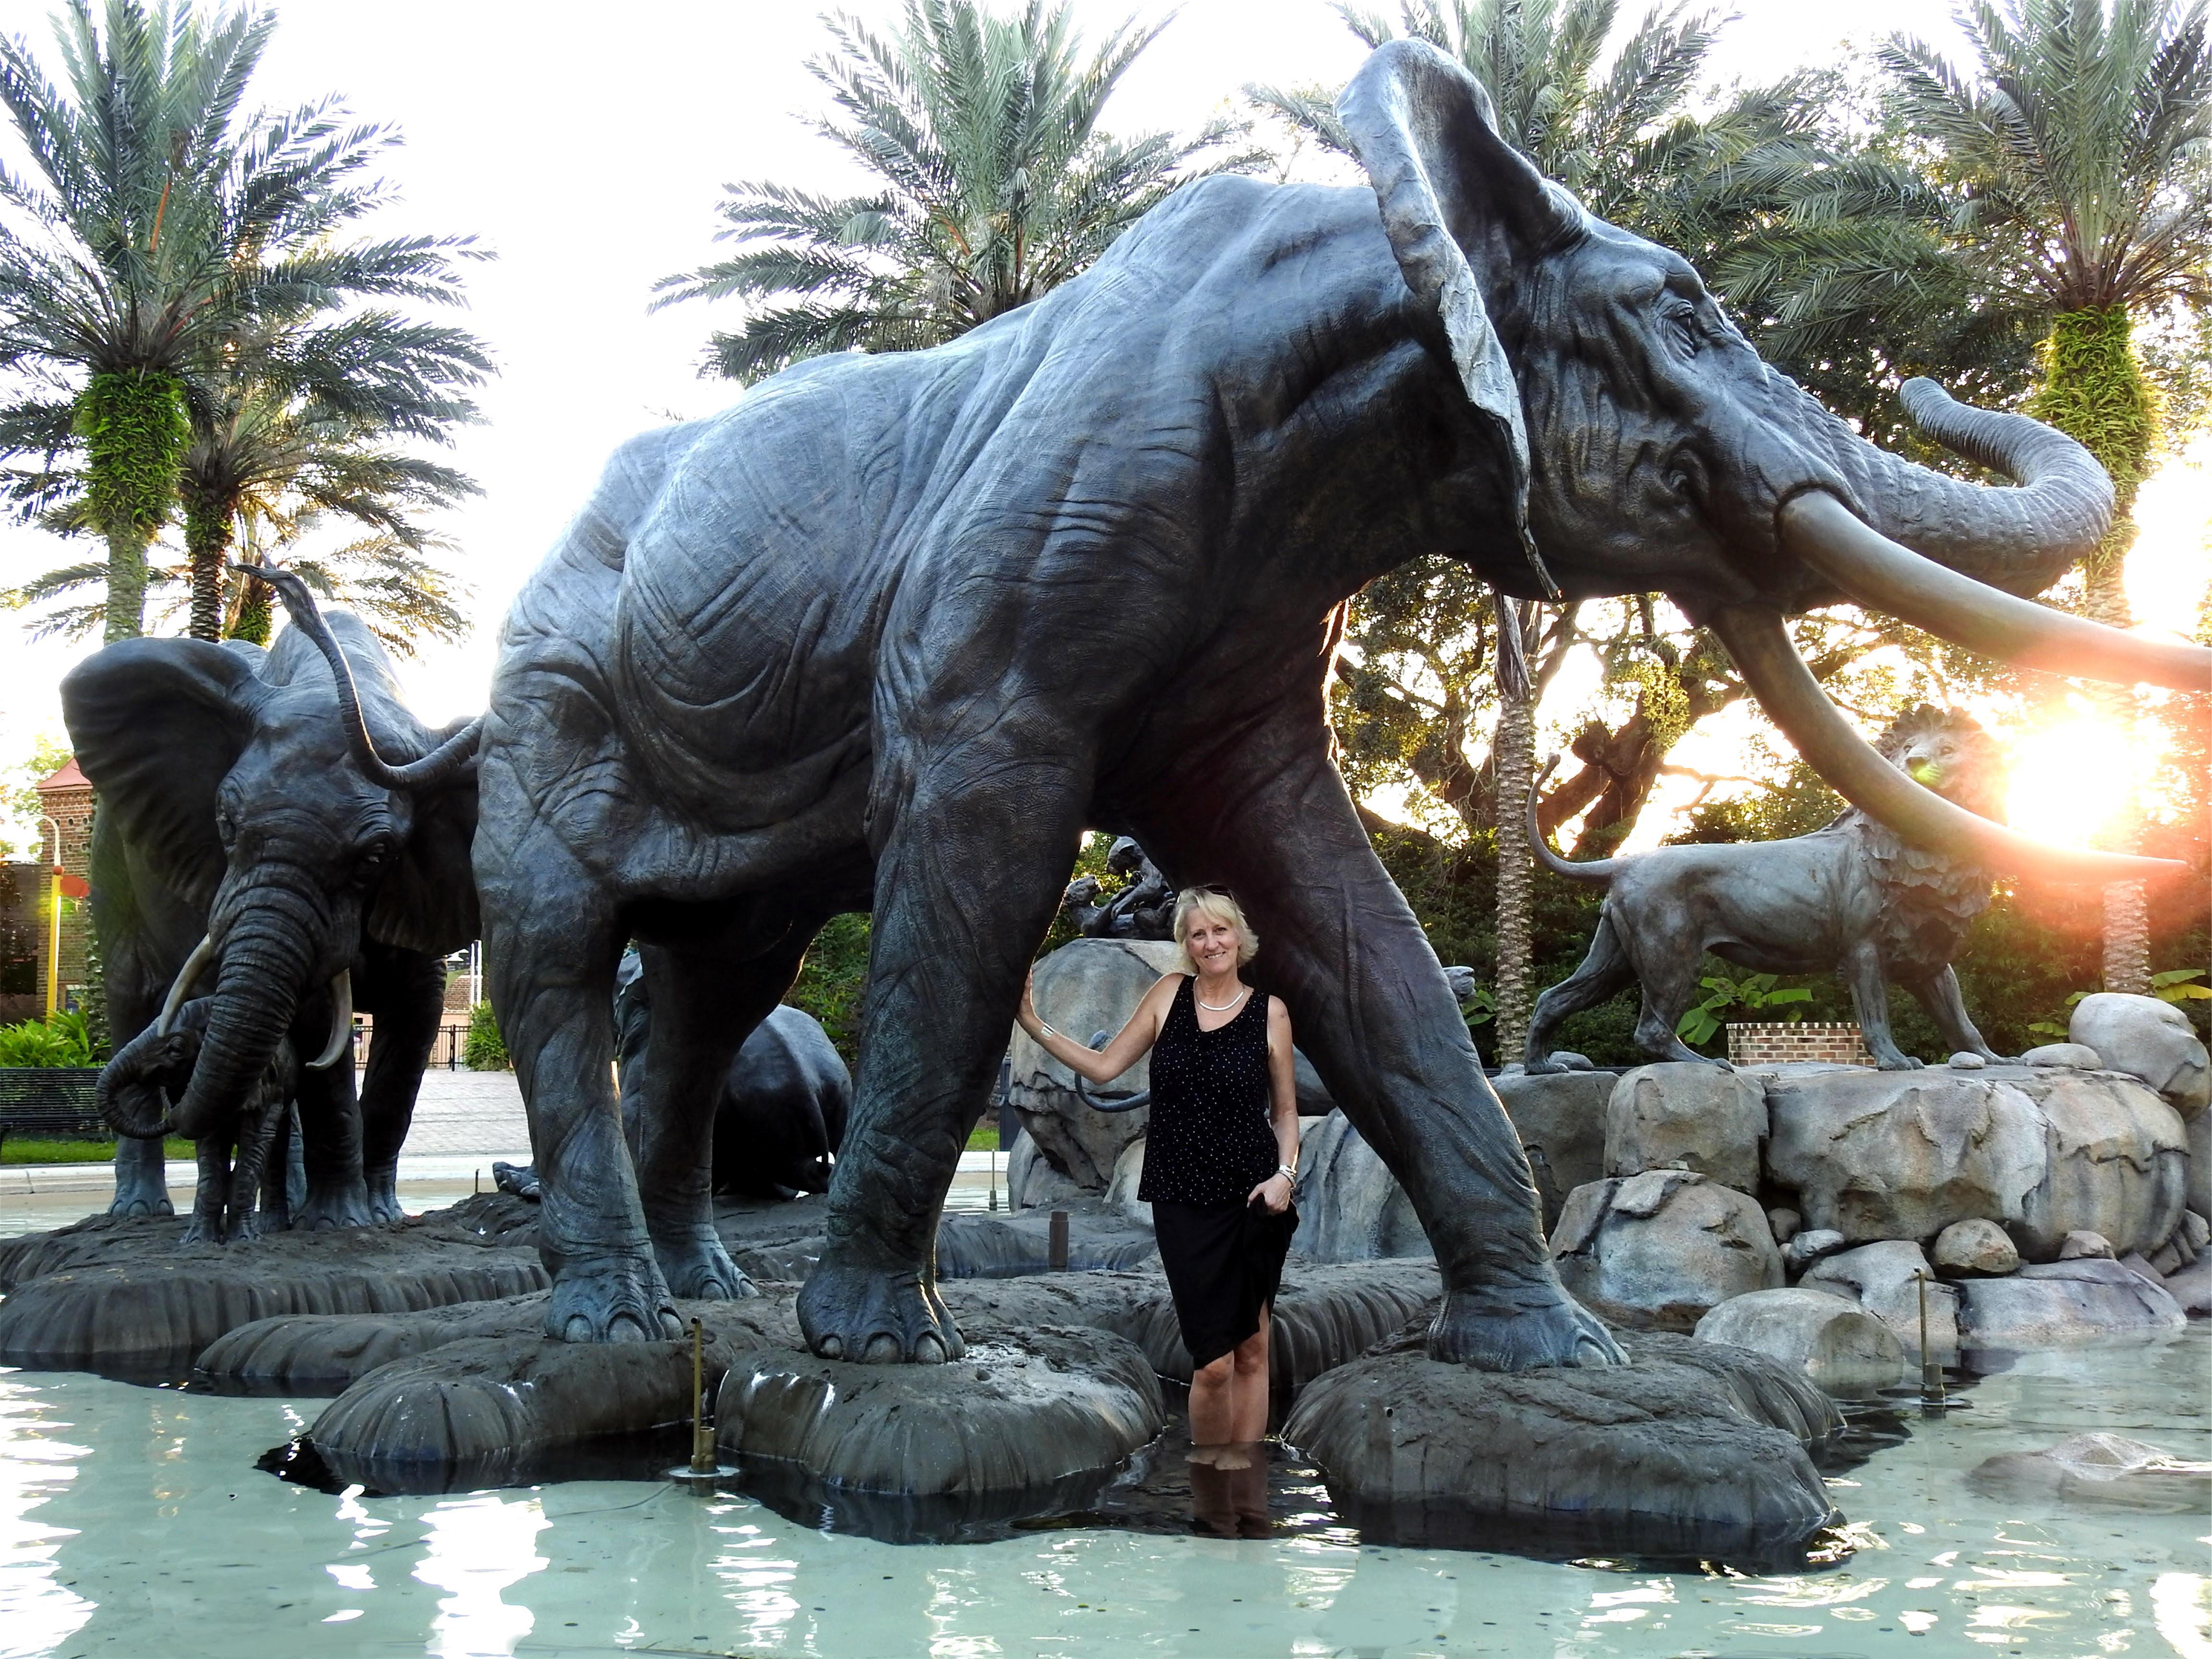 Bull MaquetteThe Audubon Zoo Sculpture ProjectThe Elephant Family -